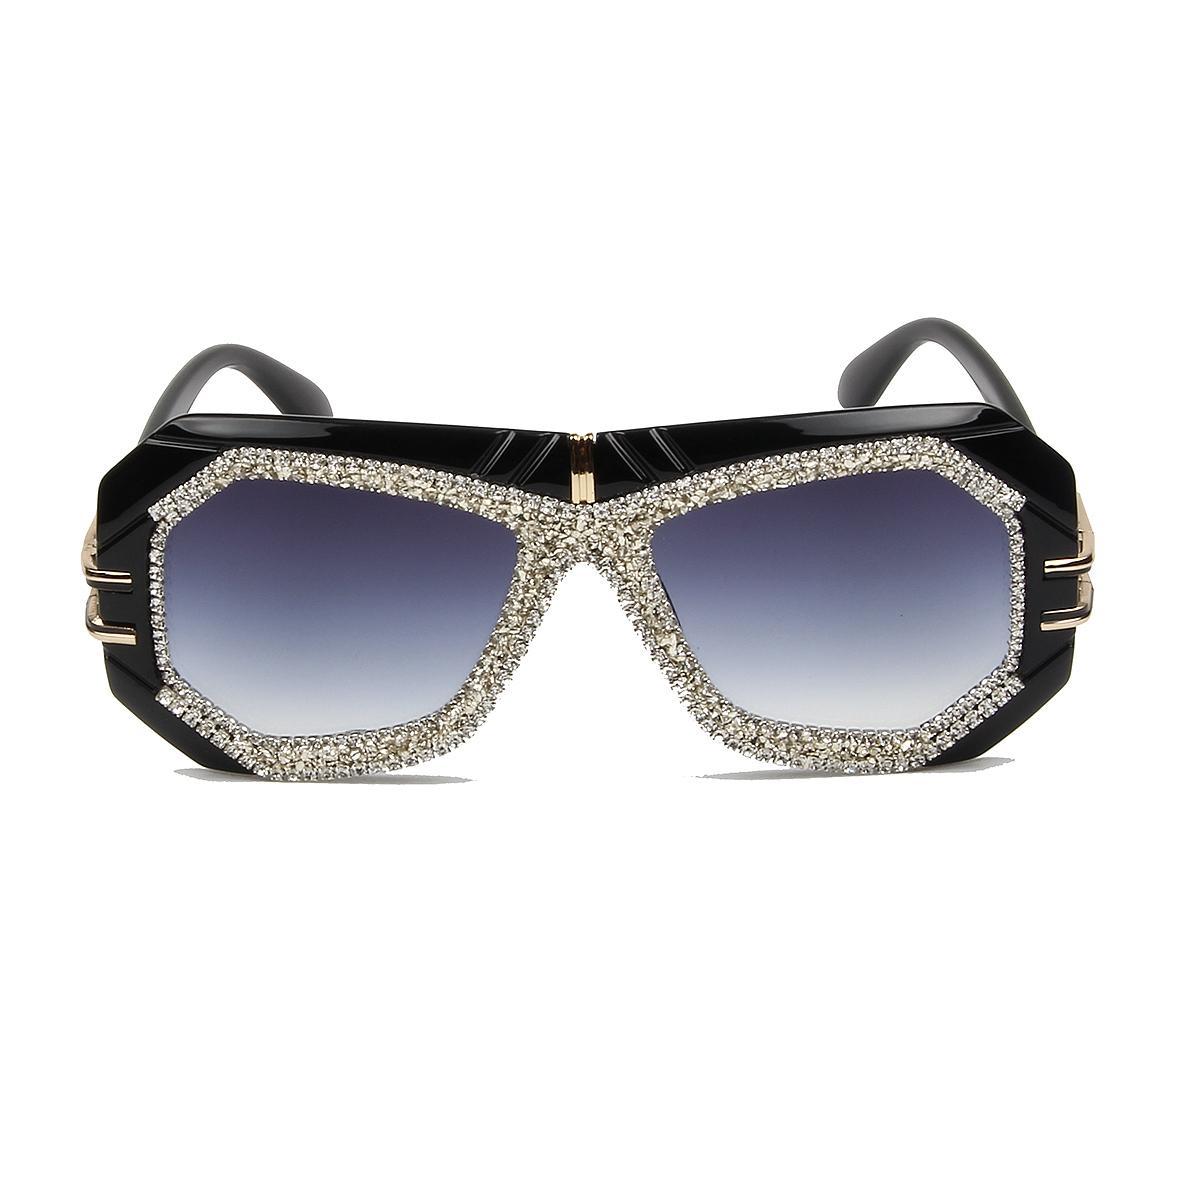 64f85ff17608c Luxury Women Vintage Rhinestone Oversize Pilot Sunglasses – Fomoloo